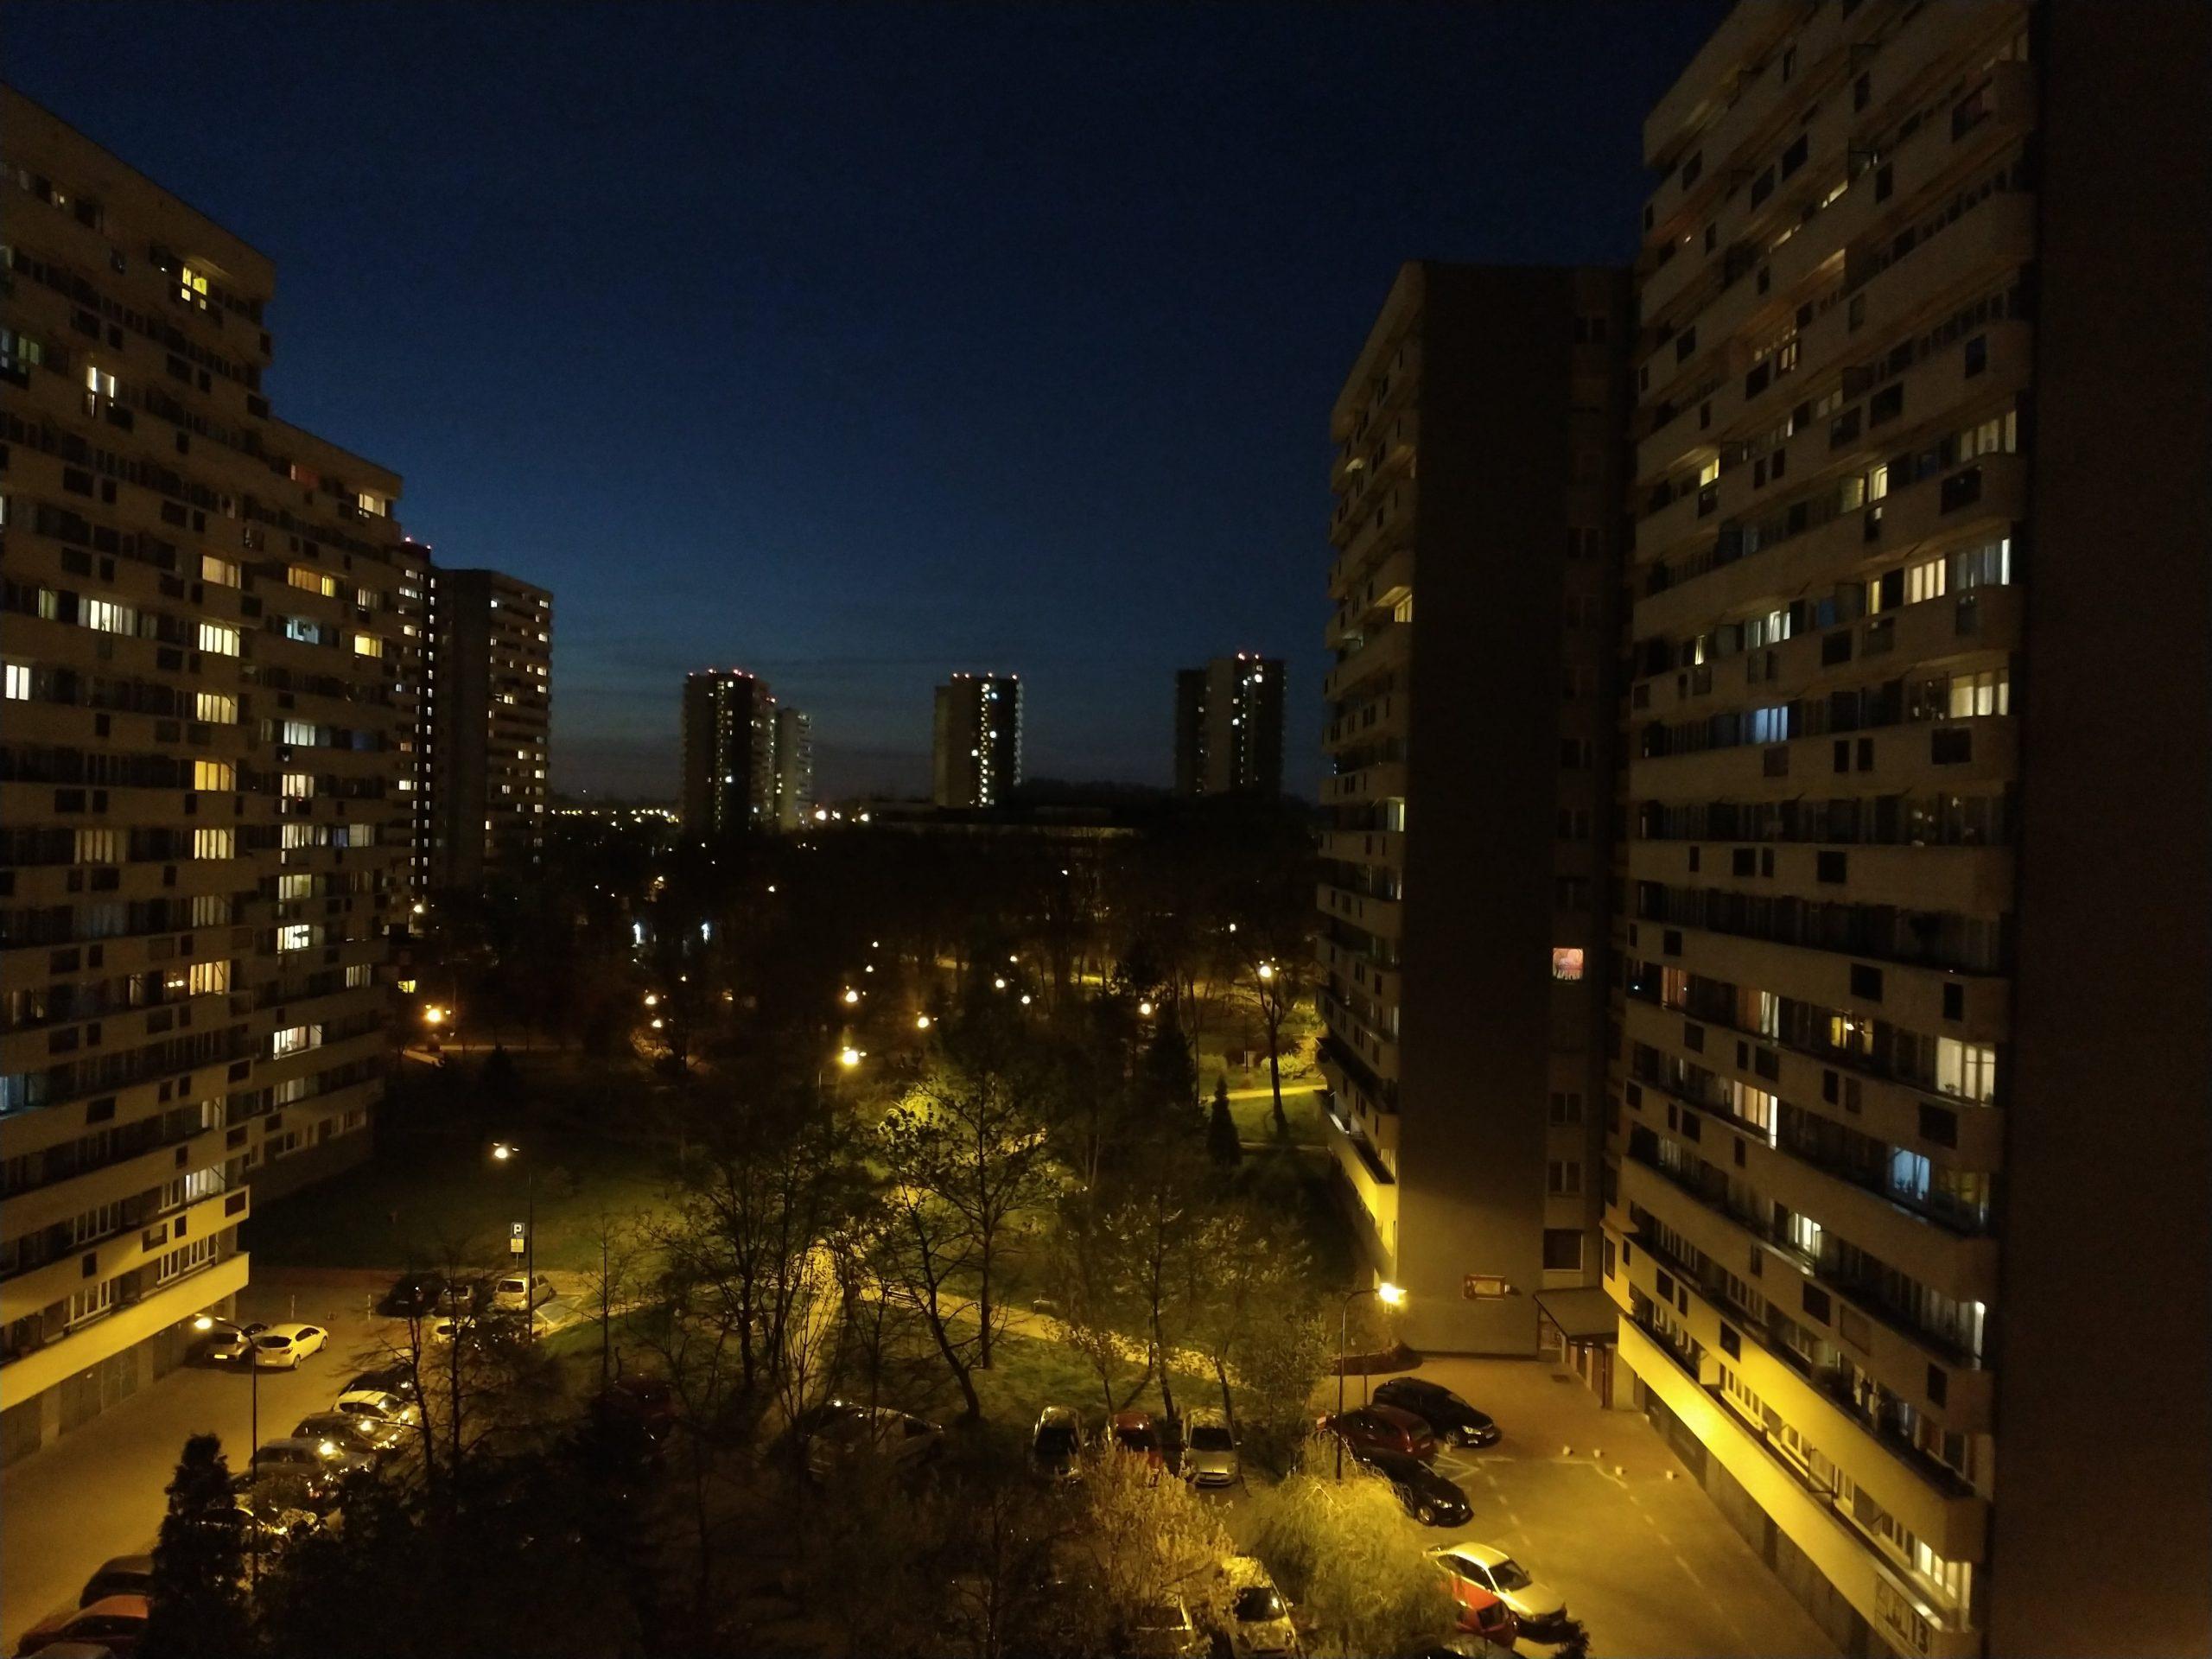 Zdjęcia nocne - Motorola Moto G8